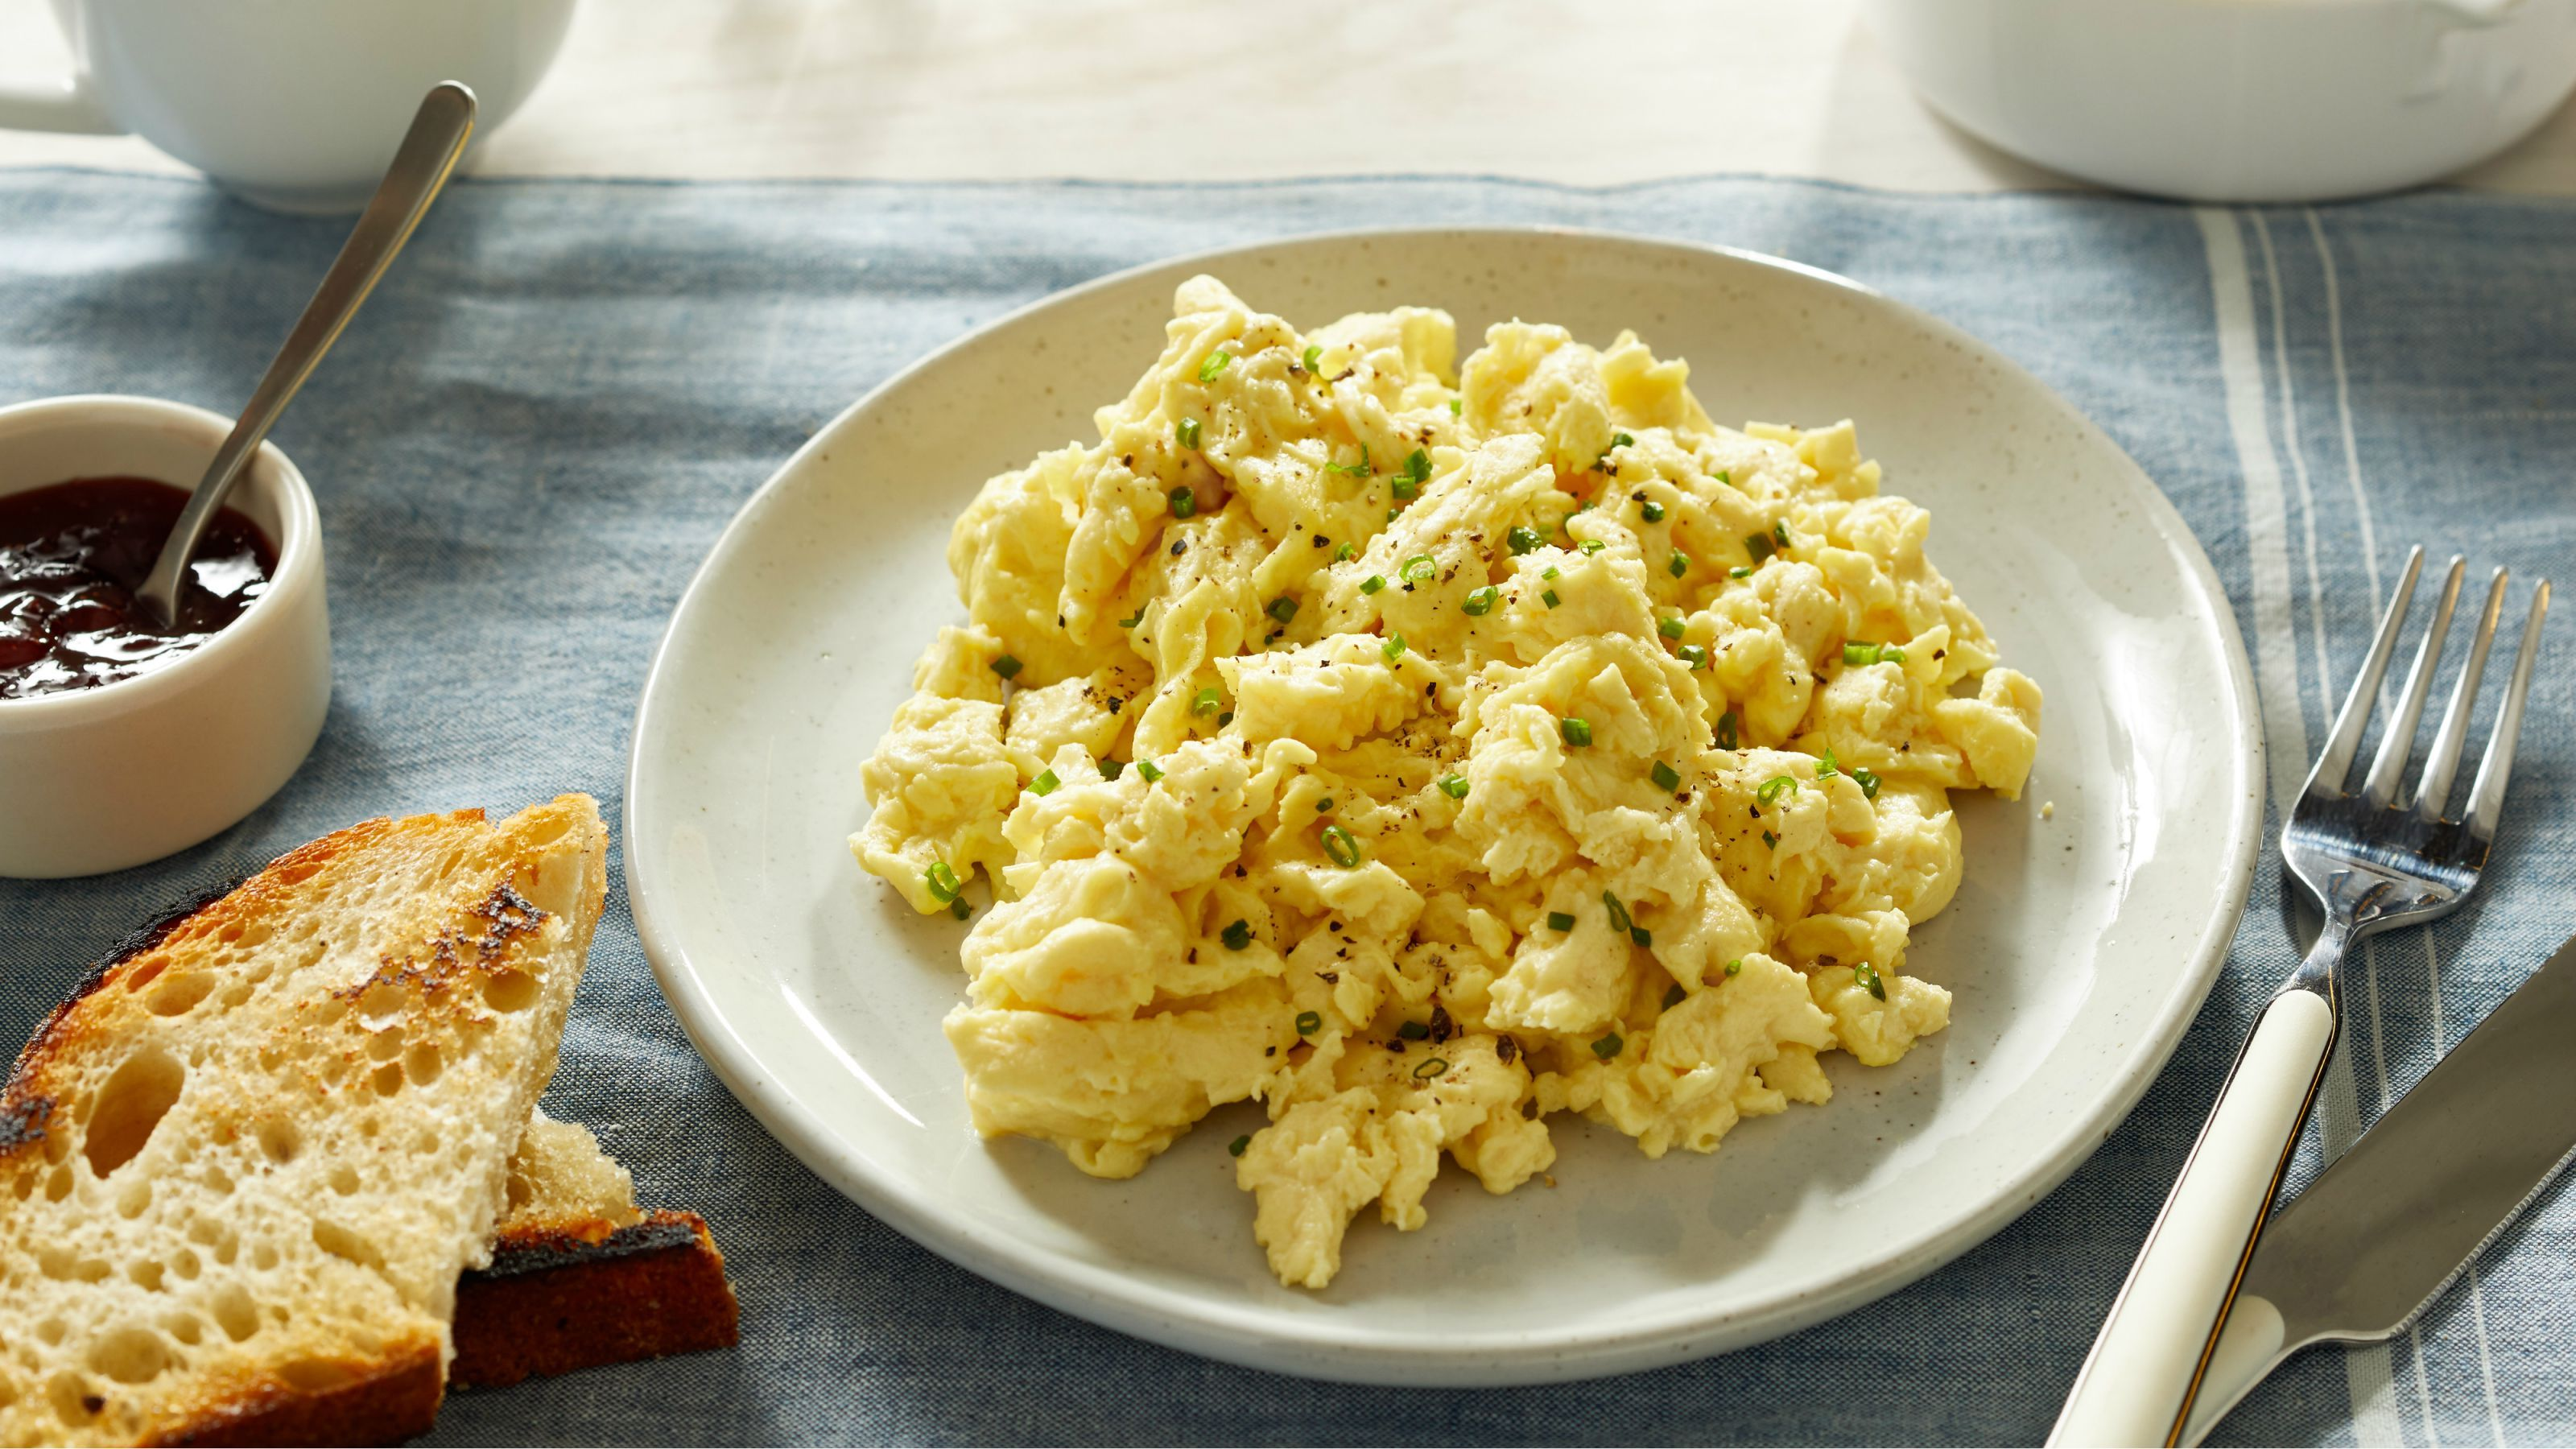 A Vegan Egg Like You Ve Never Seen Before Food Vegan Eggs Healthy Breakfast